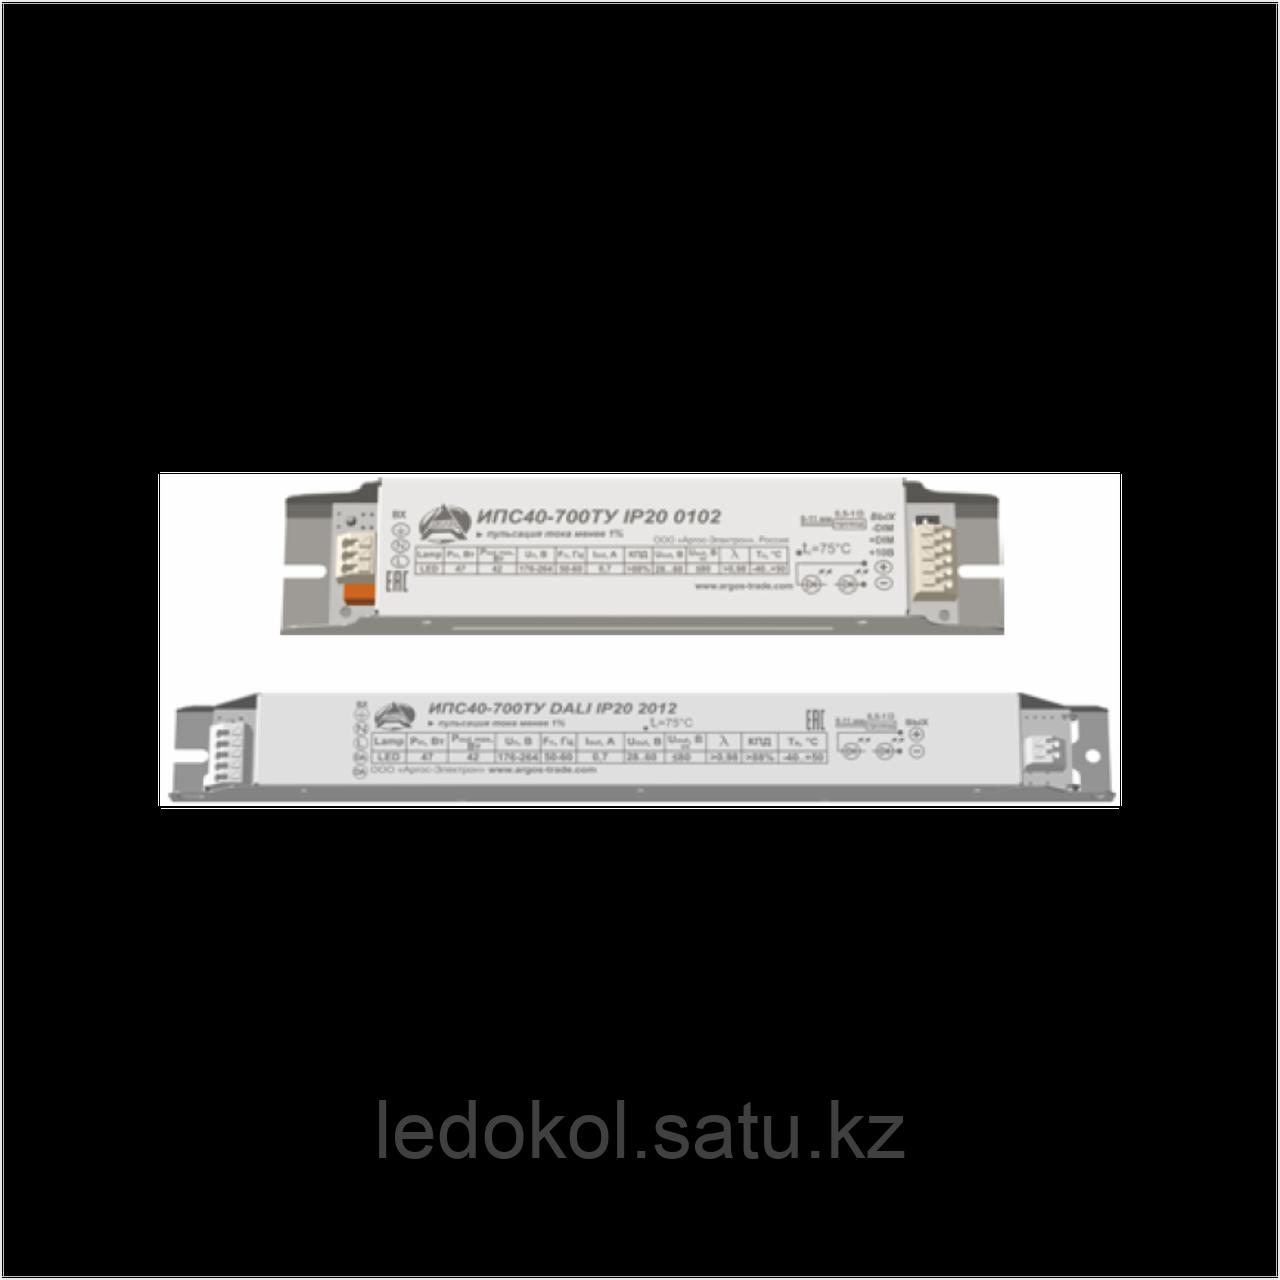 Источник питания Аргос ИПС40-700ТУ DALI IP20  2012